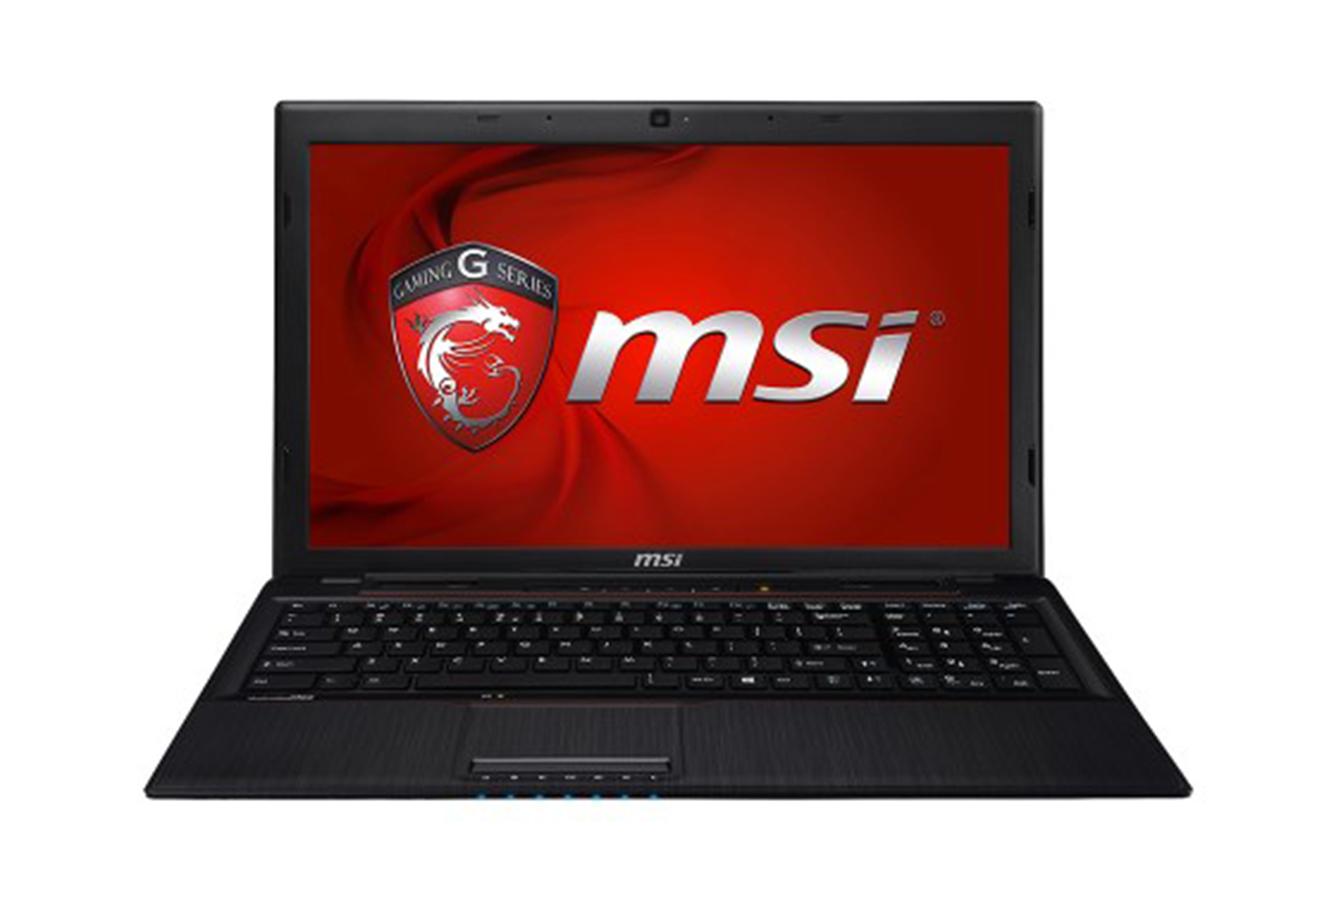 Laptop Hire - Code Audio Visual